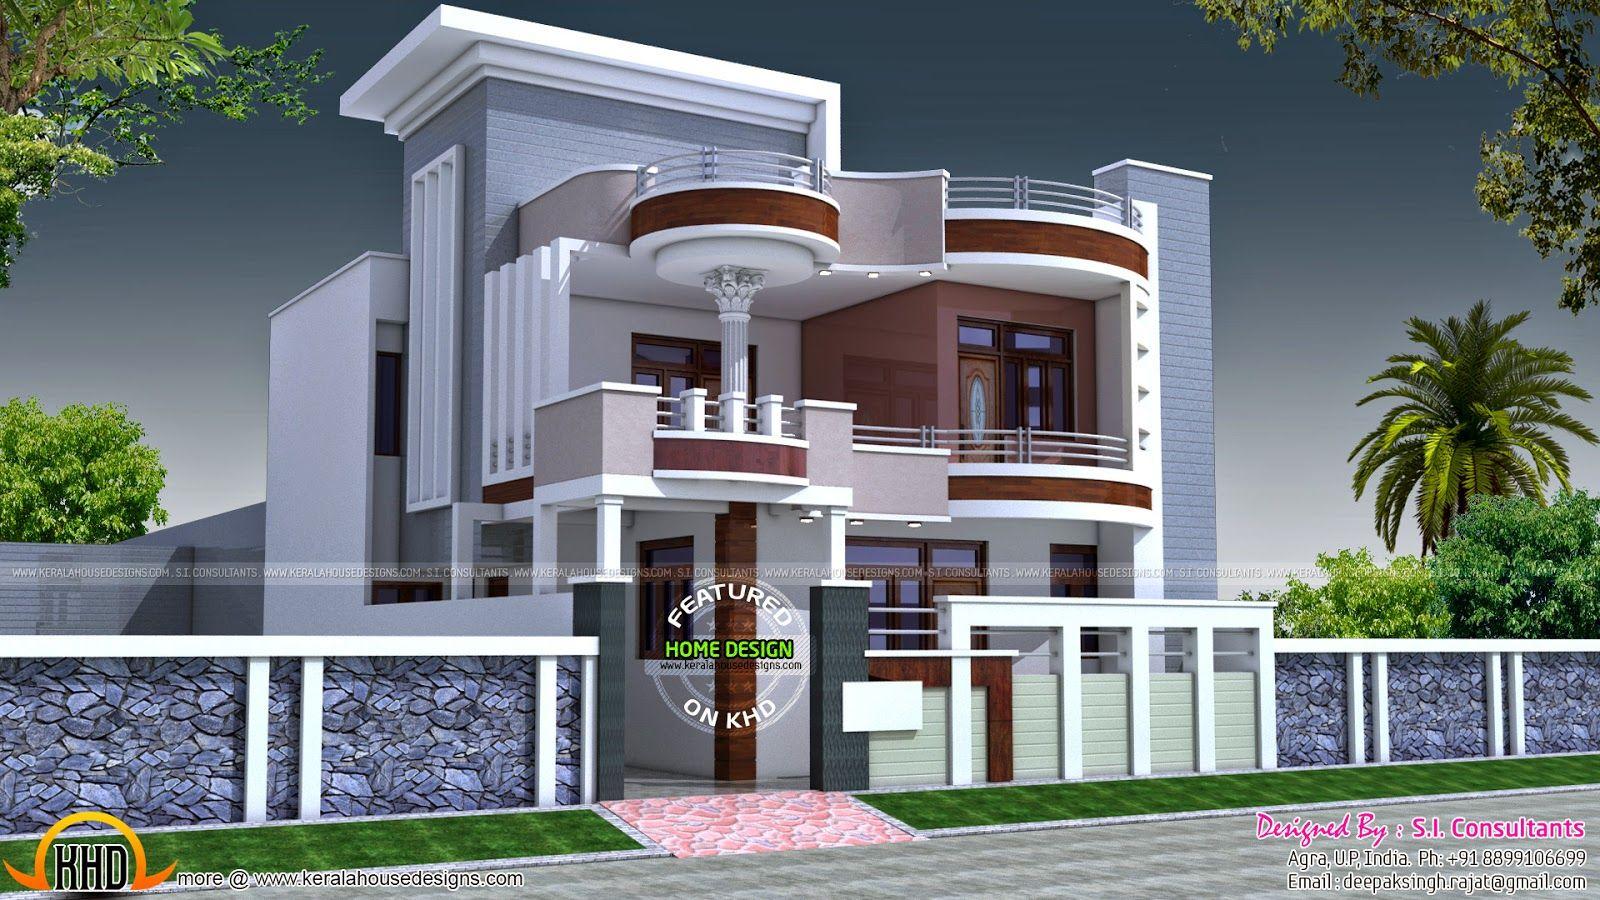 Interior design ideas for small homes in kerala valeria valeriavavi on pinterest